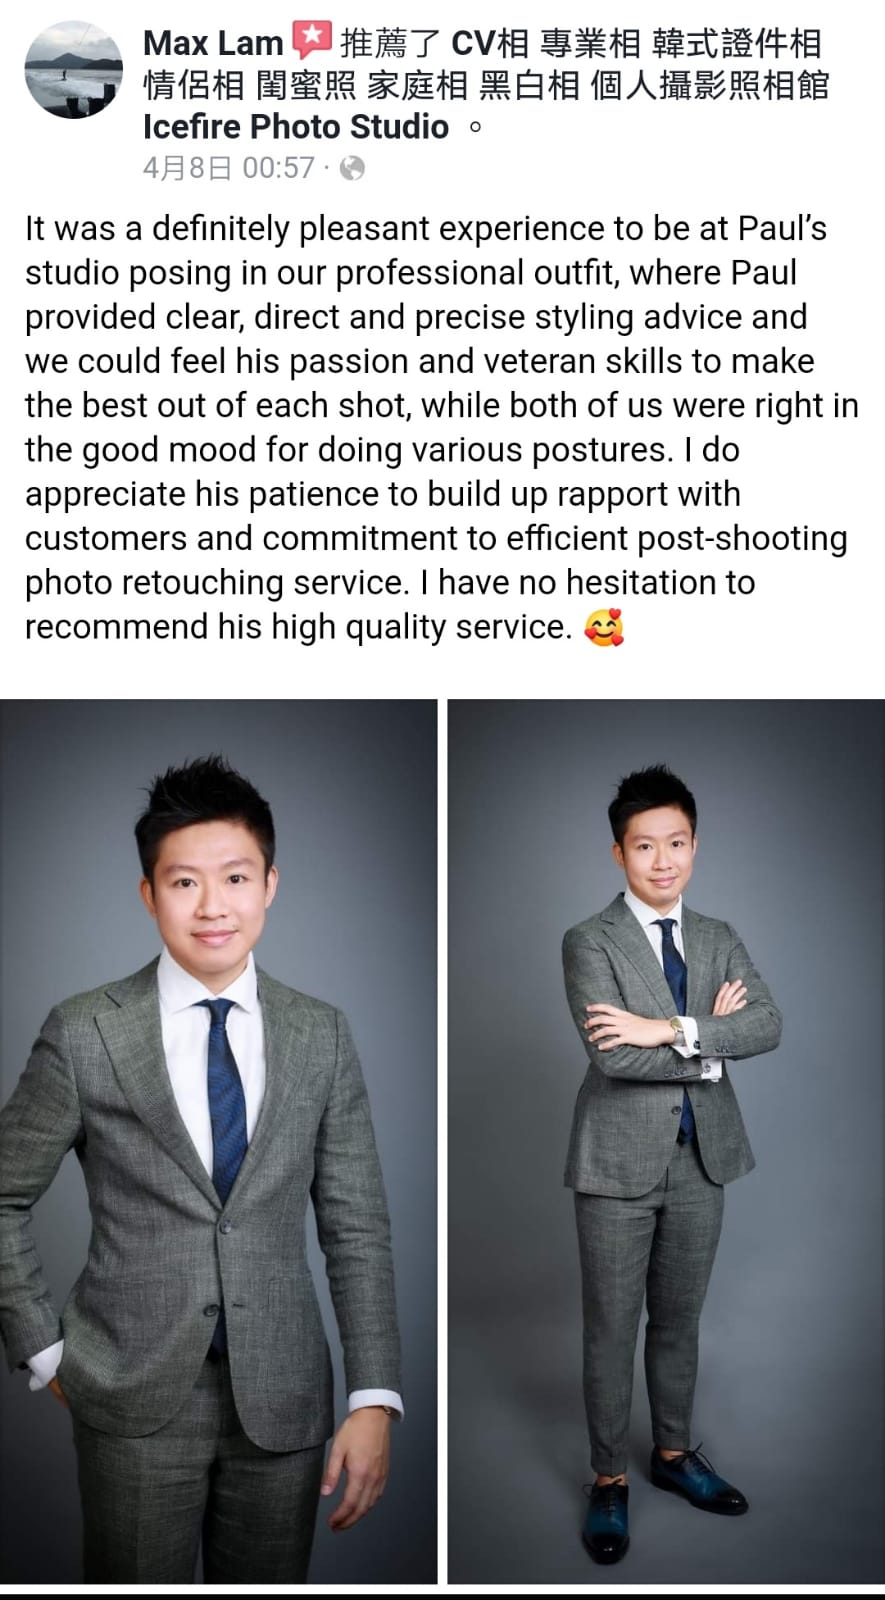 cv professional portrait photo icefire studio